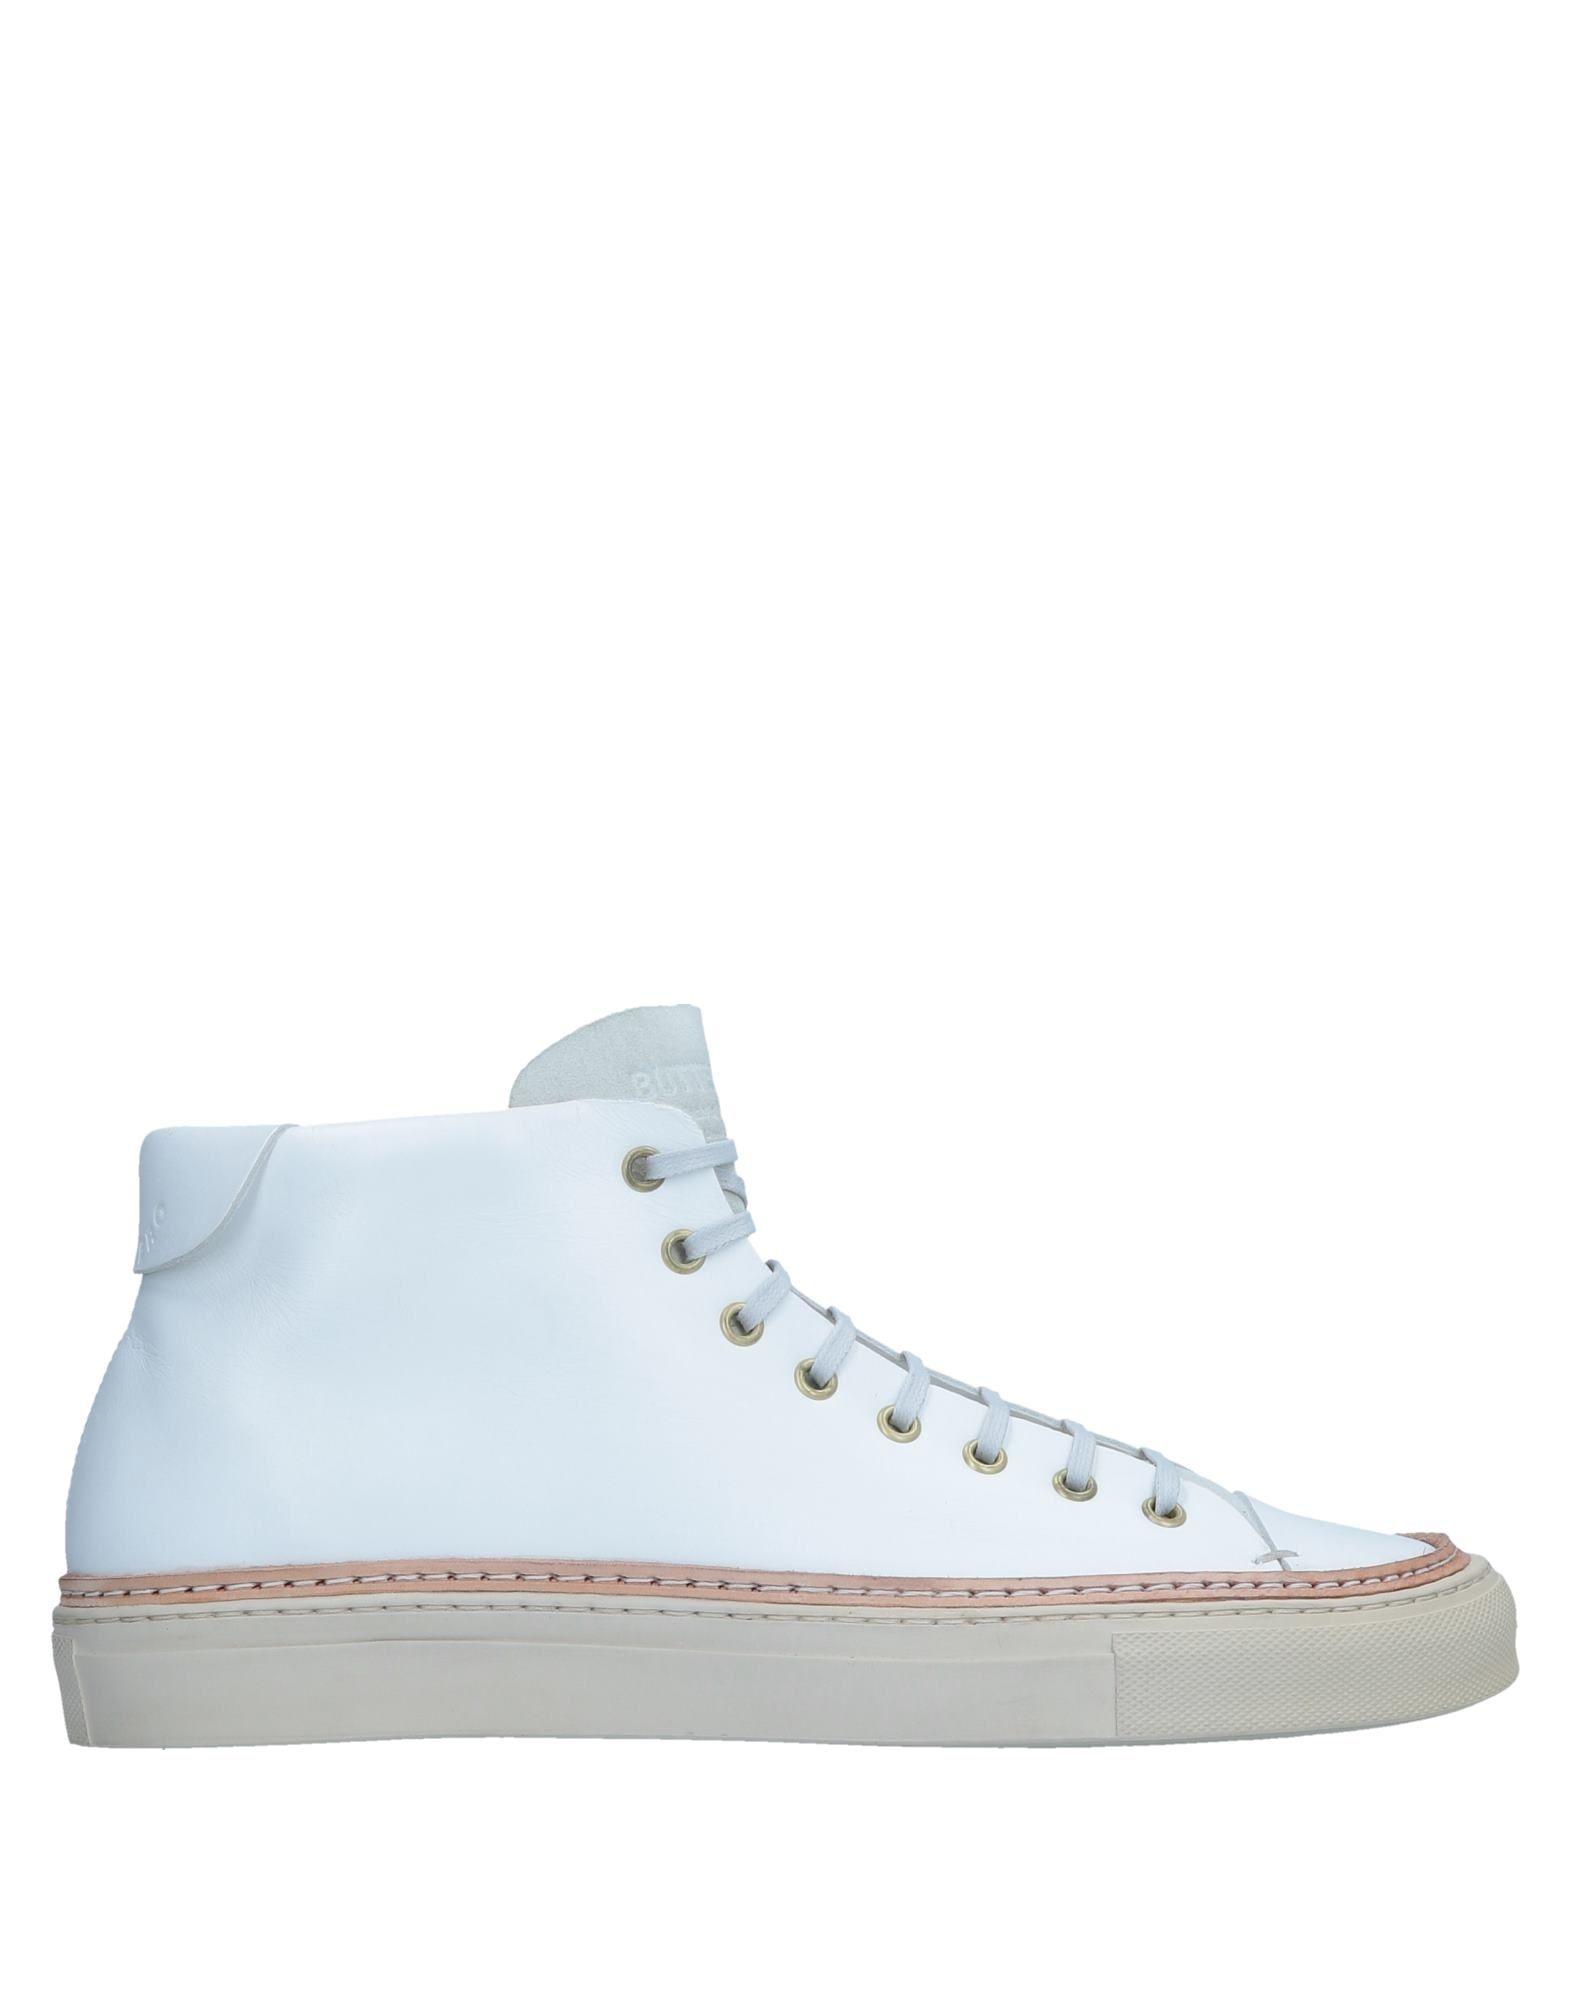 Buttero® Sneakers Herren  11552267DJ Gute Qualität beliebte Schuhe